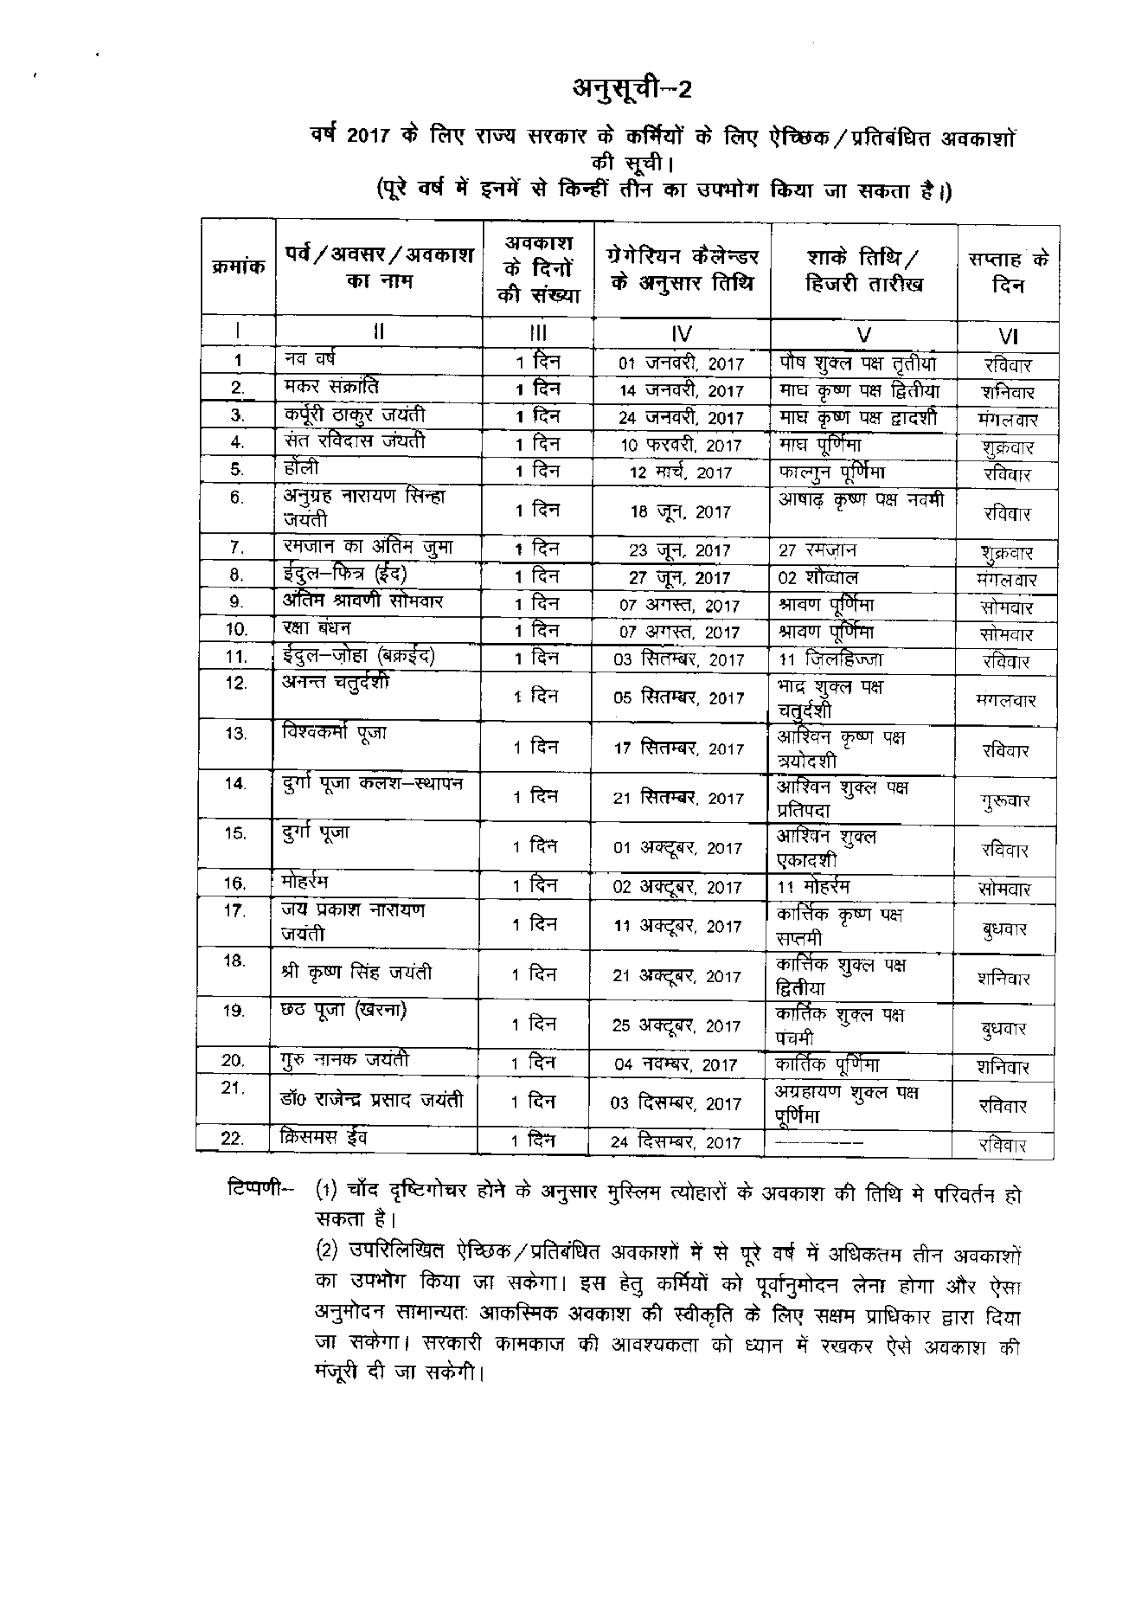 10657) Bihar Government Calendar 2017 ~ City Zone Education pertaining to Bihar Calendar 2017